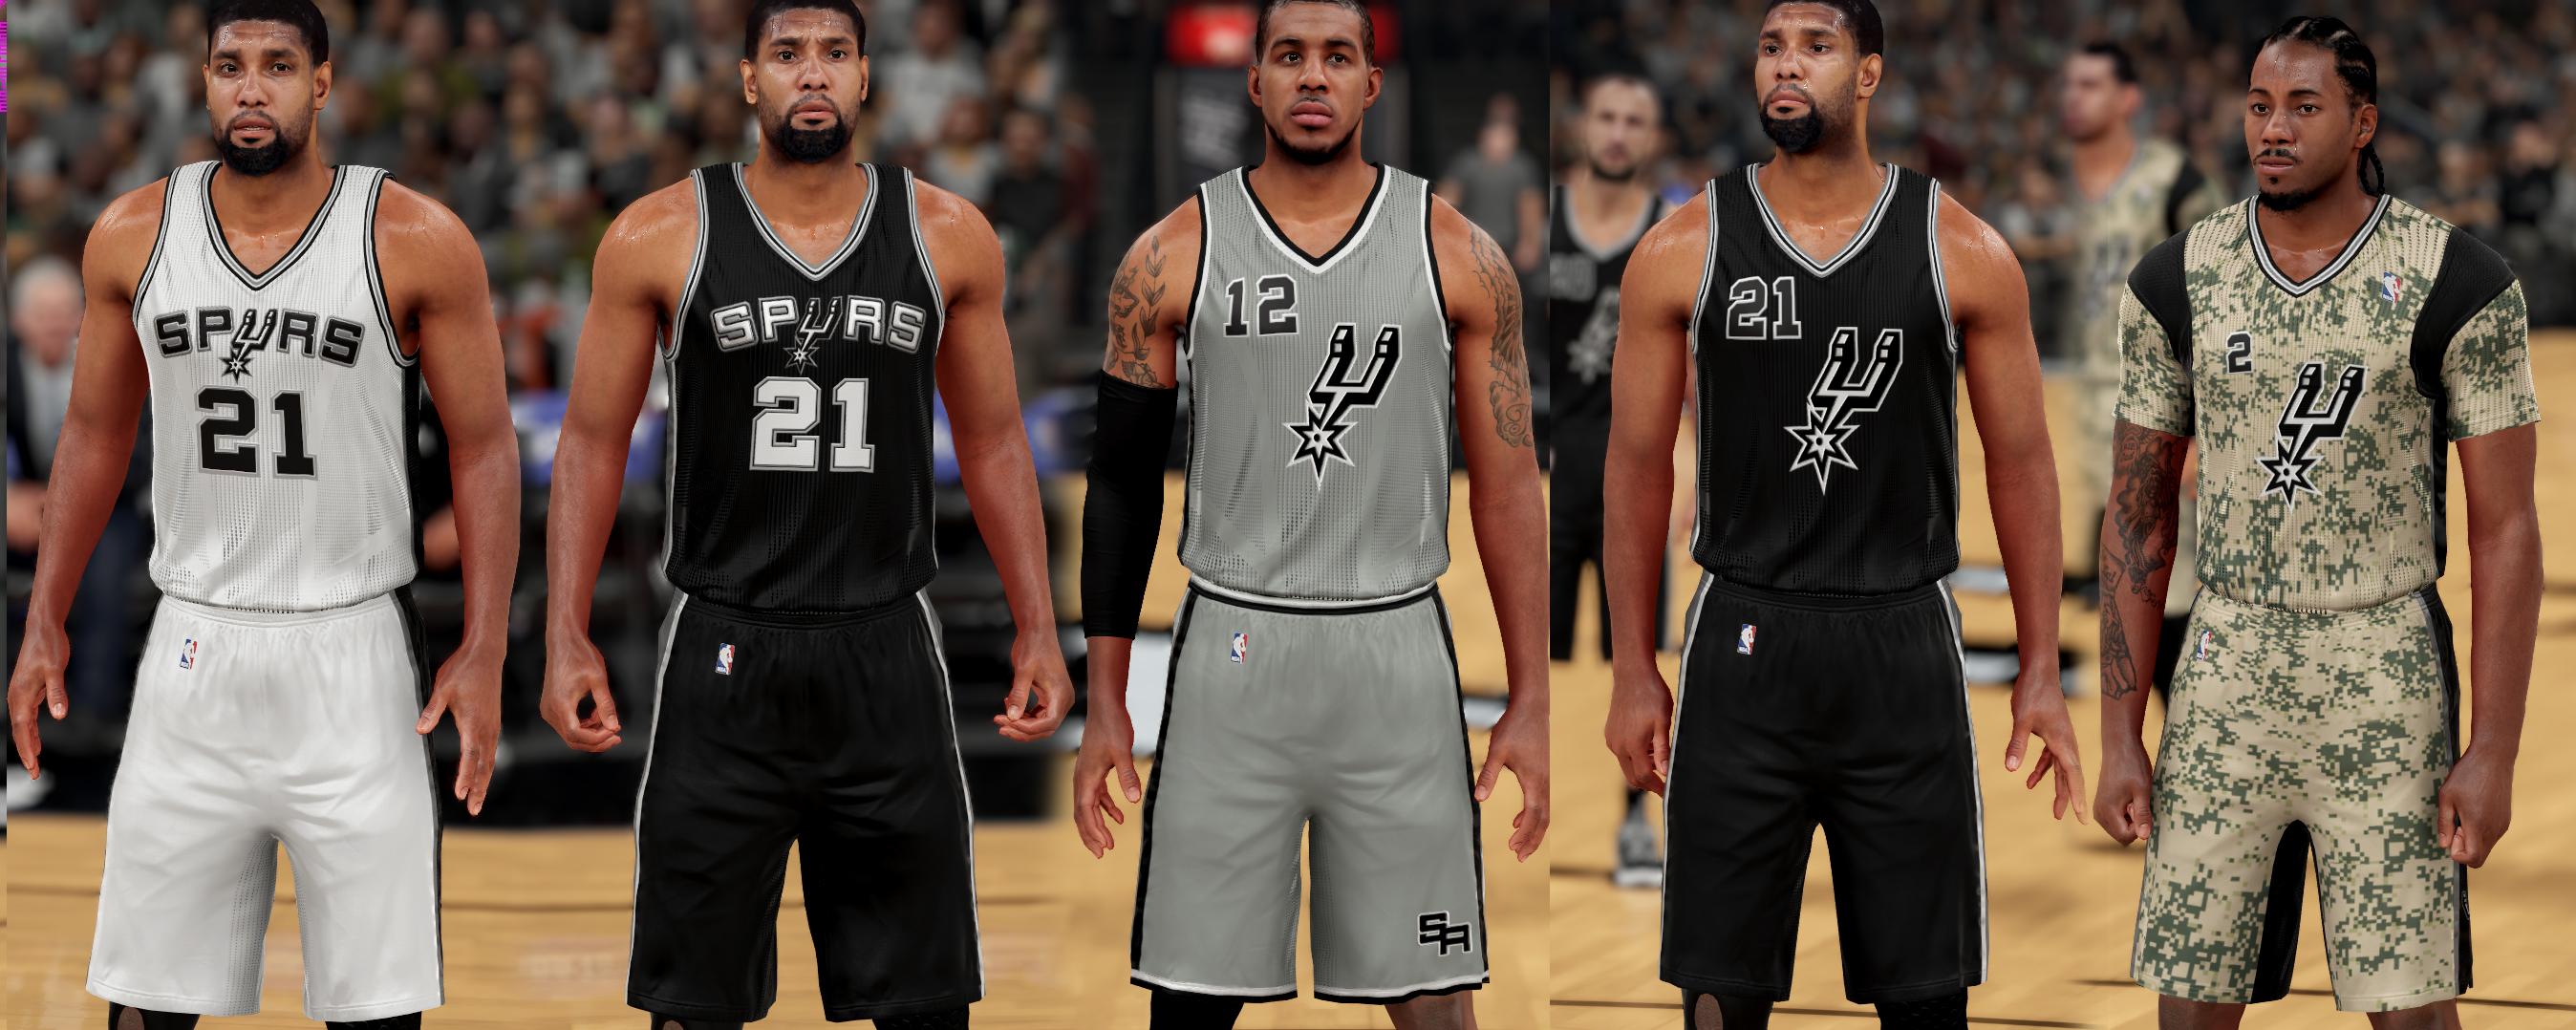 4e4f641ca419 NLSC Forum • Downloads - San Antonio Spurs Jersey